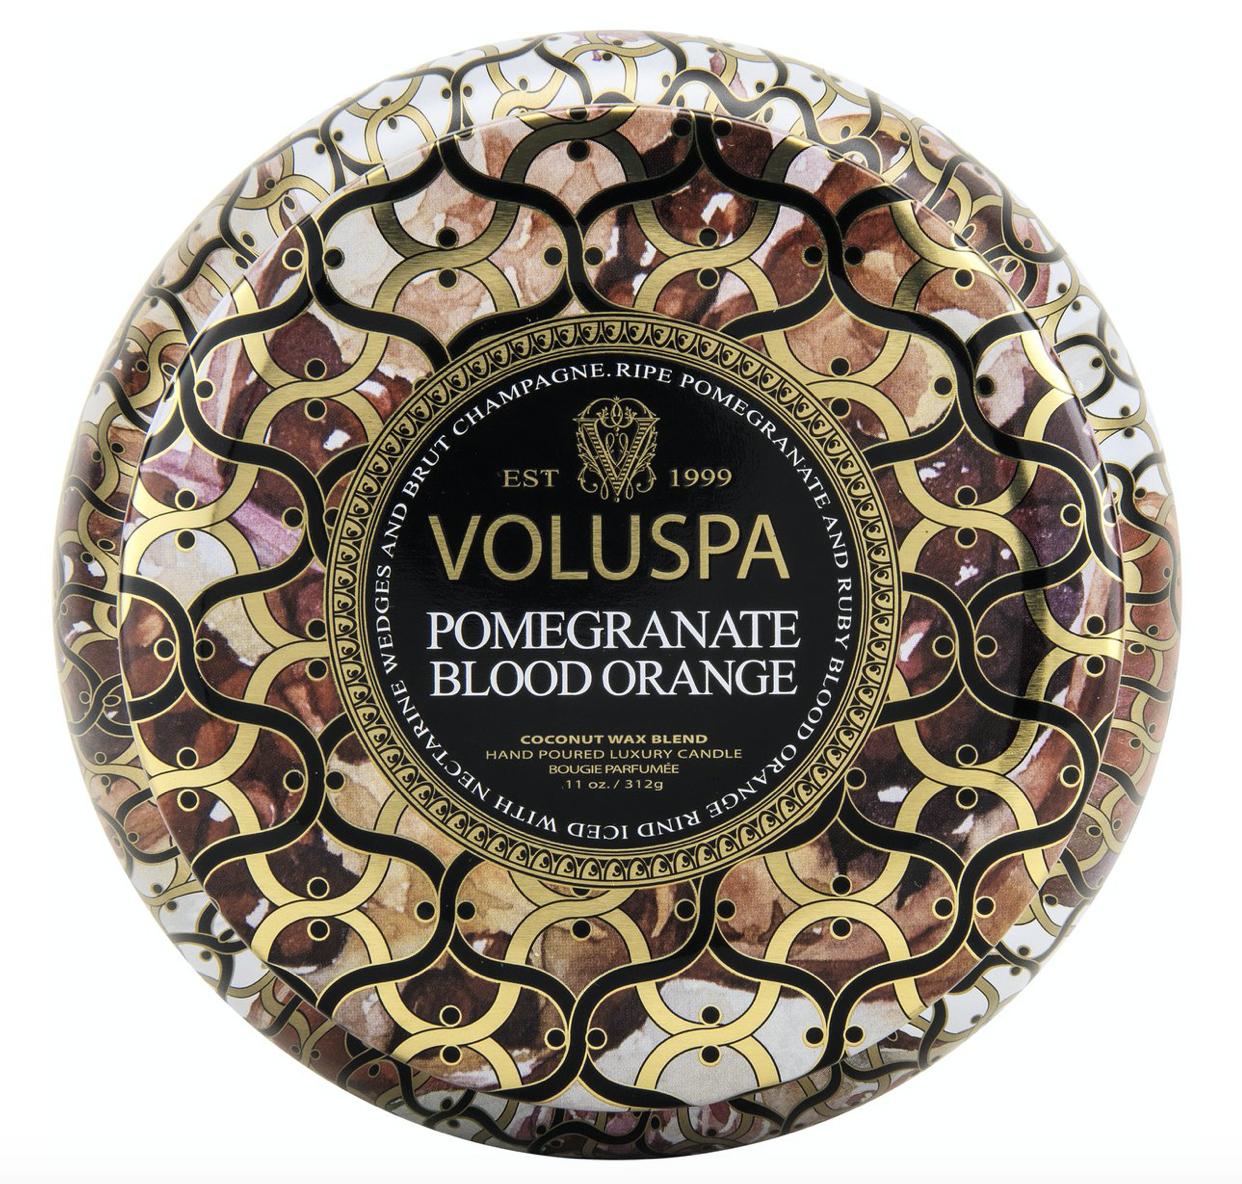 Voluspa Pomegranate Blood Orange, 2-Wick Maison Metallo Candle